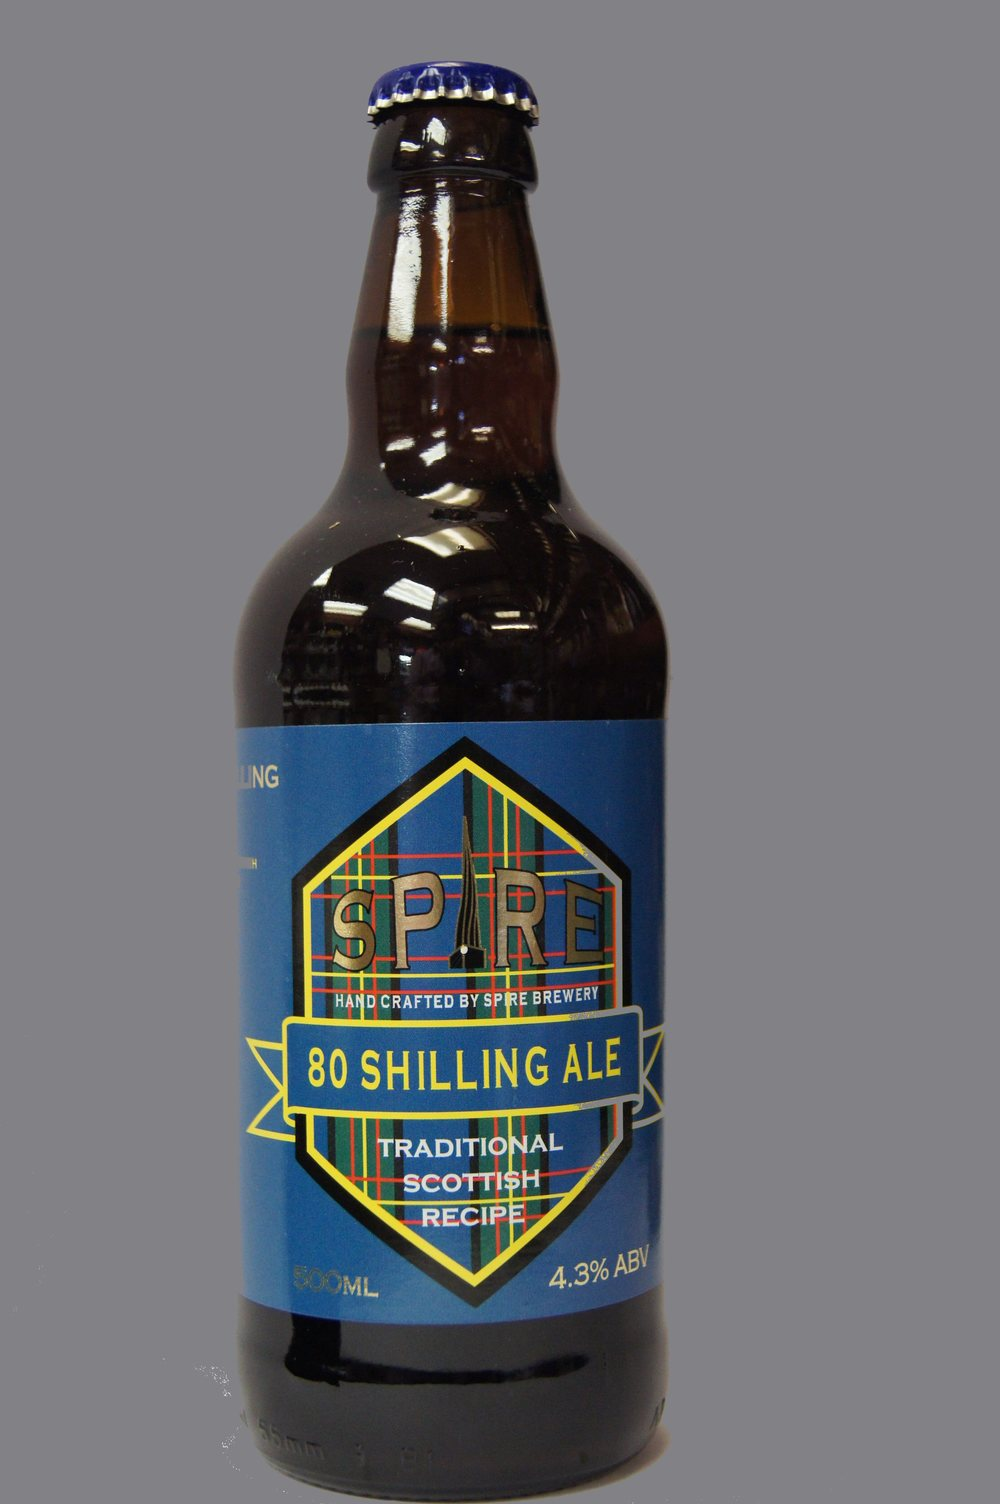 SPIRE-80 Shilling ale.jpg